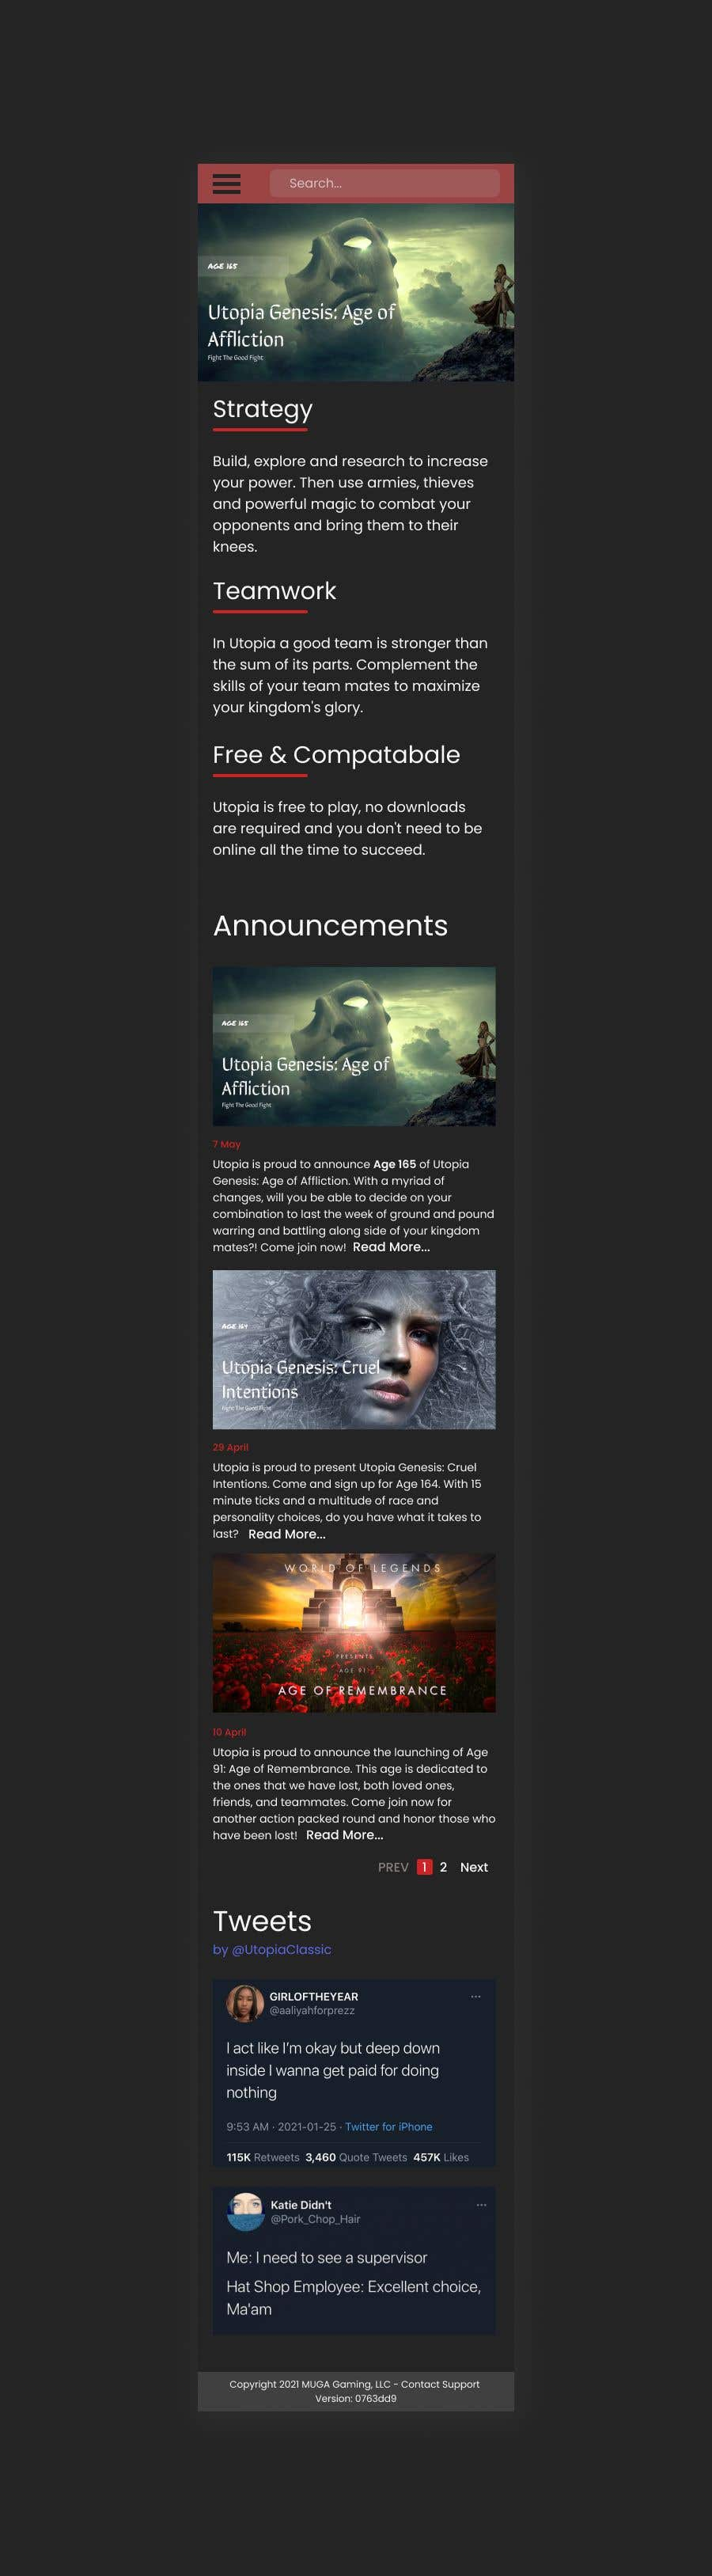 Bài tham dự cuộc thi #                                        40                                      cho                                         Utopia Game Home Page and Logo